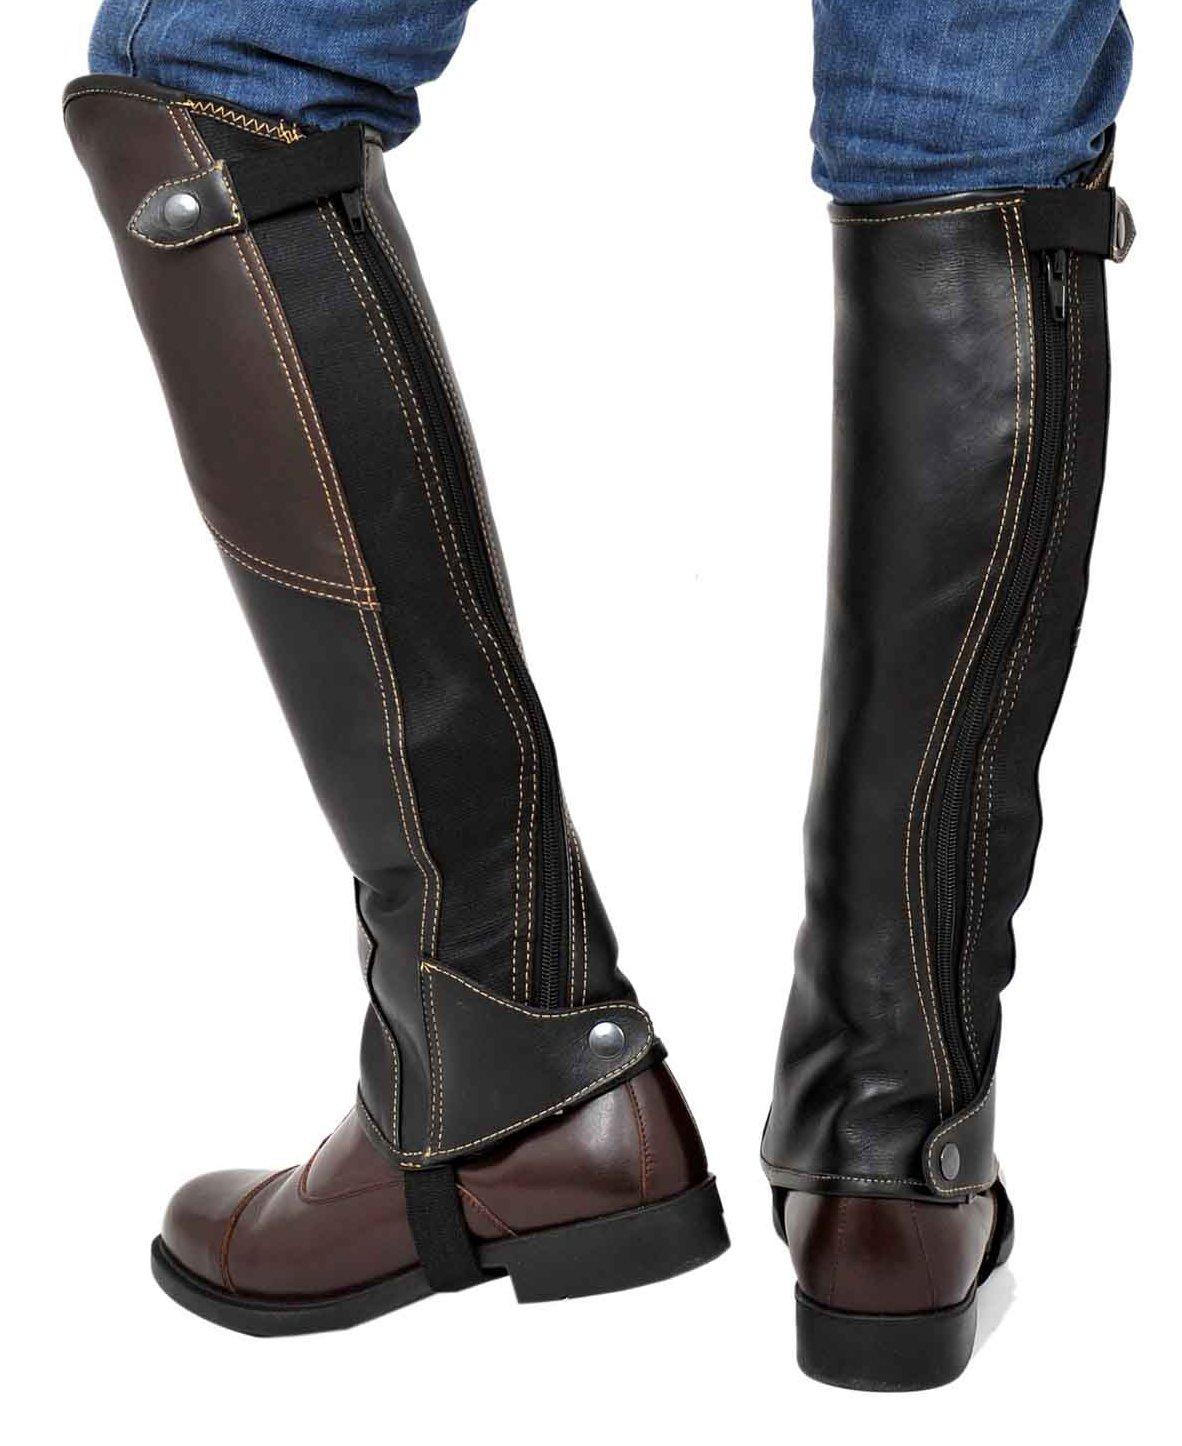 Riders Trend Guêtres en cuir femme 2tons noir Noir/marron moyen U8G9PAid